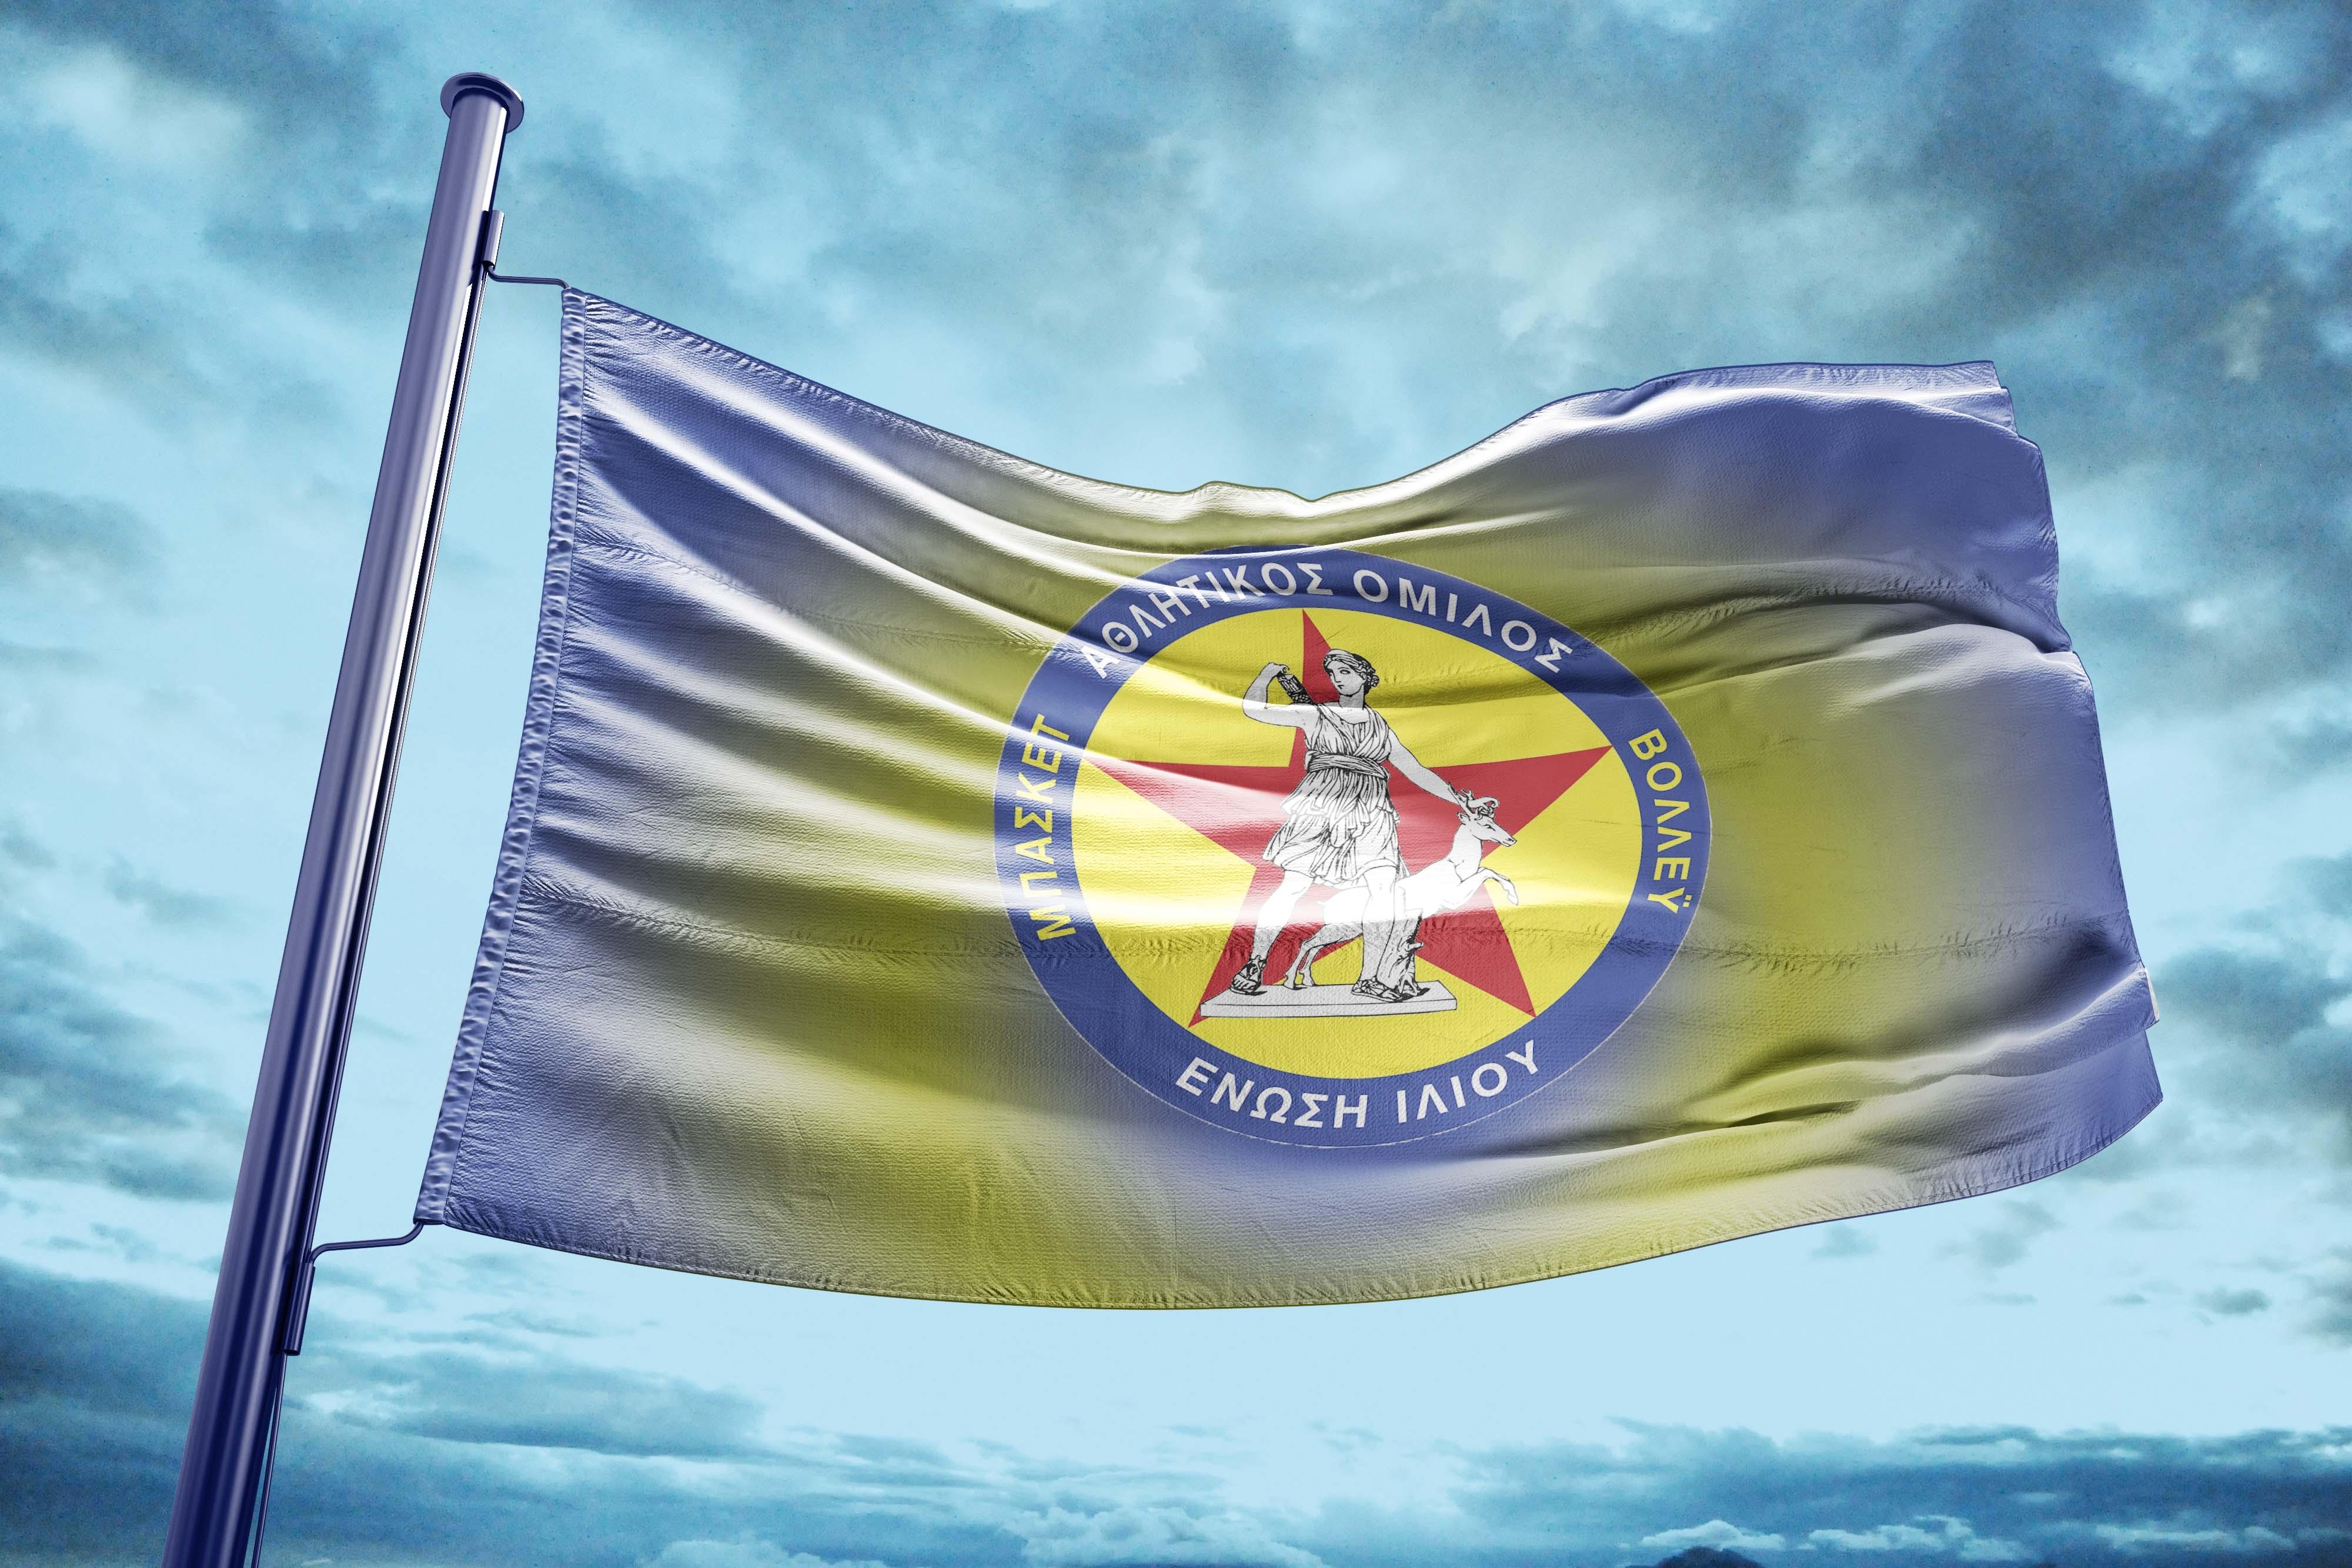 IΕΣΚΑ: 2/2 για τις Νεάνιδες της Ένωσης Ιλίου!